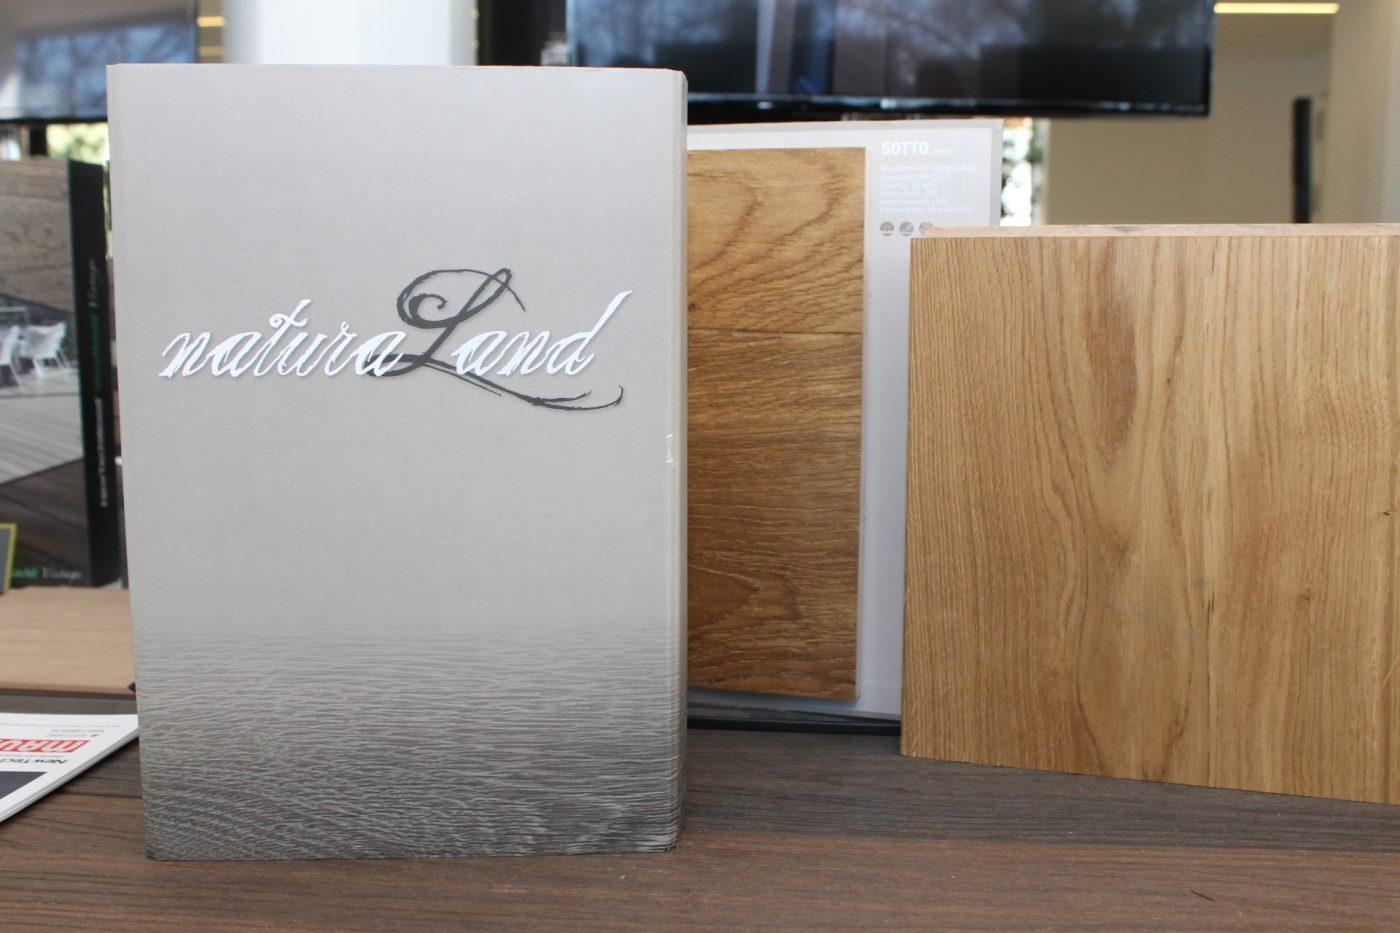 MAUSA presenta la gama NATURA LAND de parqué flotante de madera